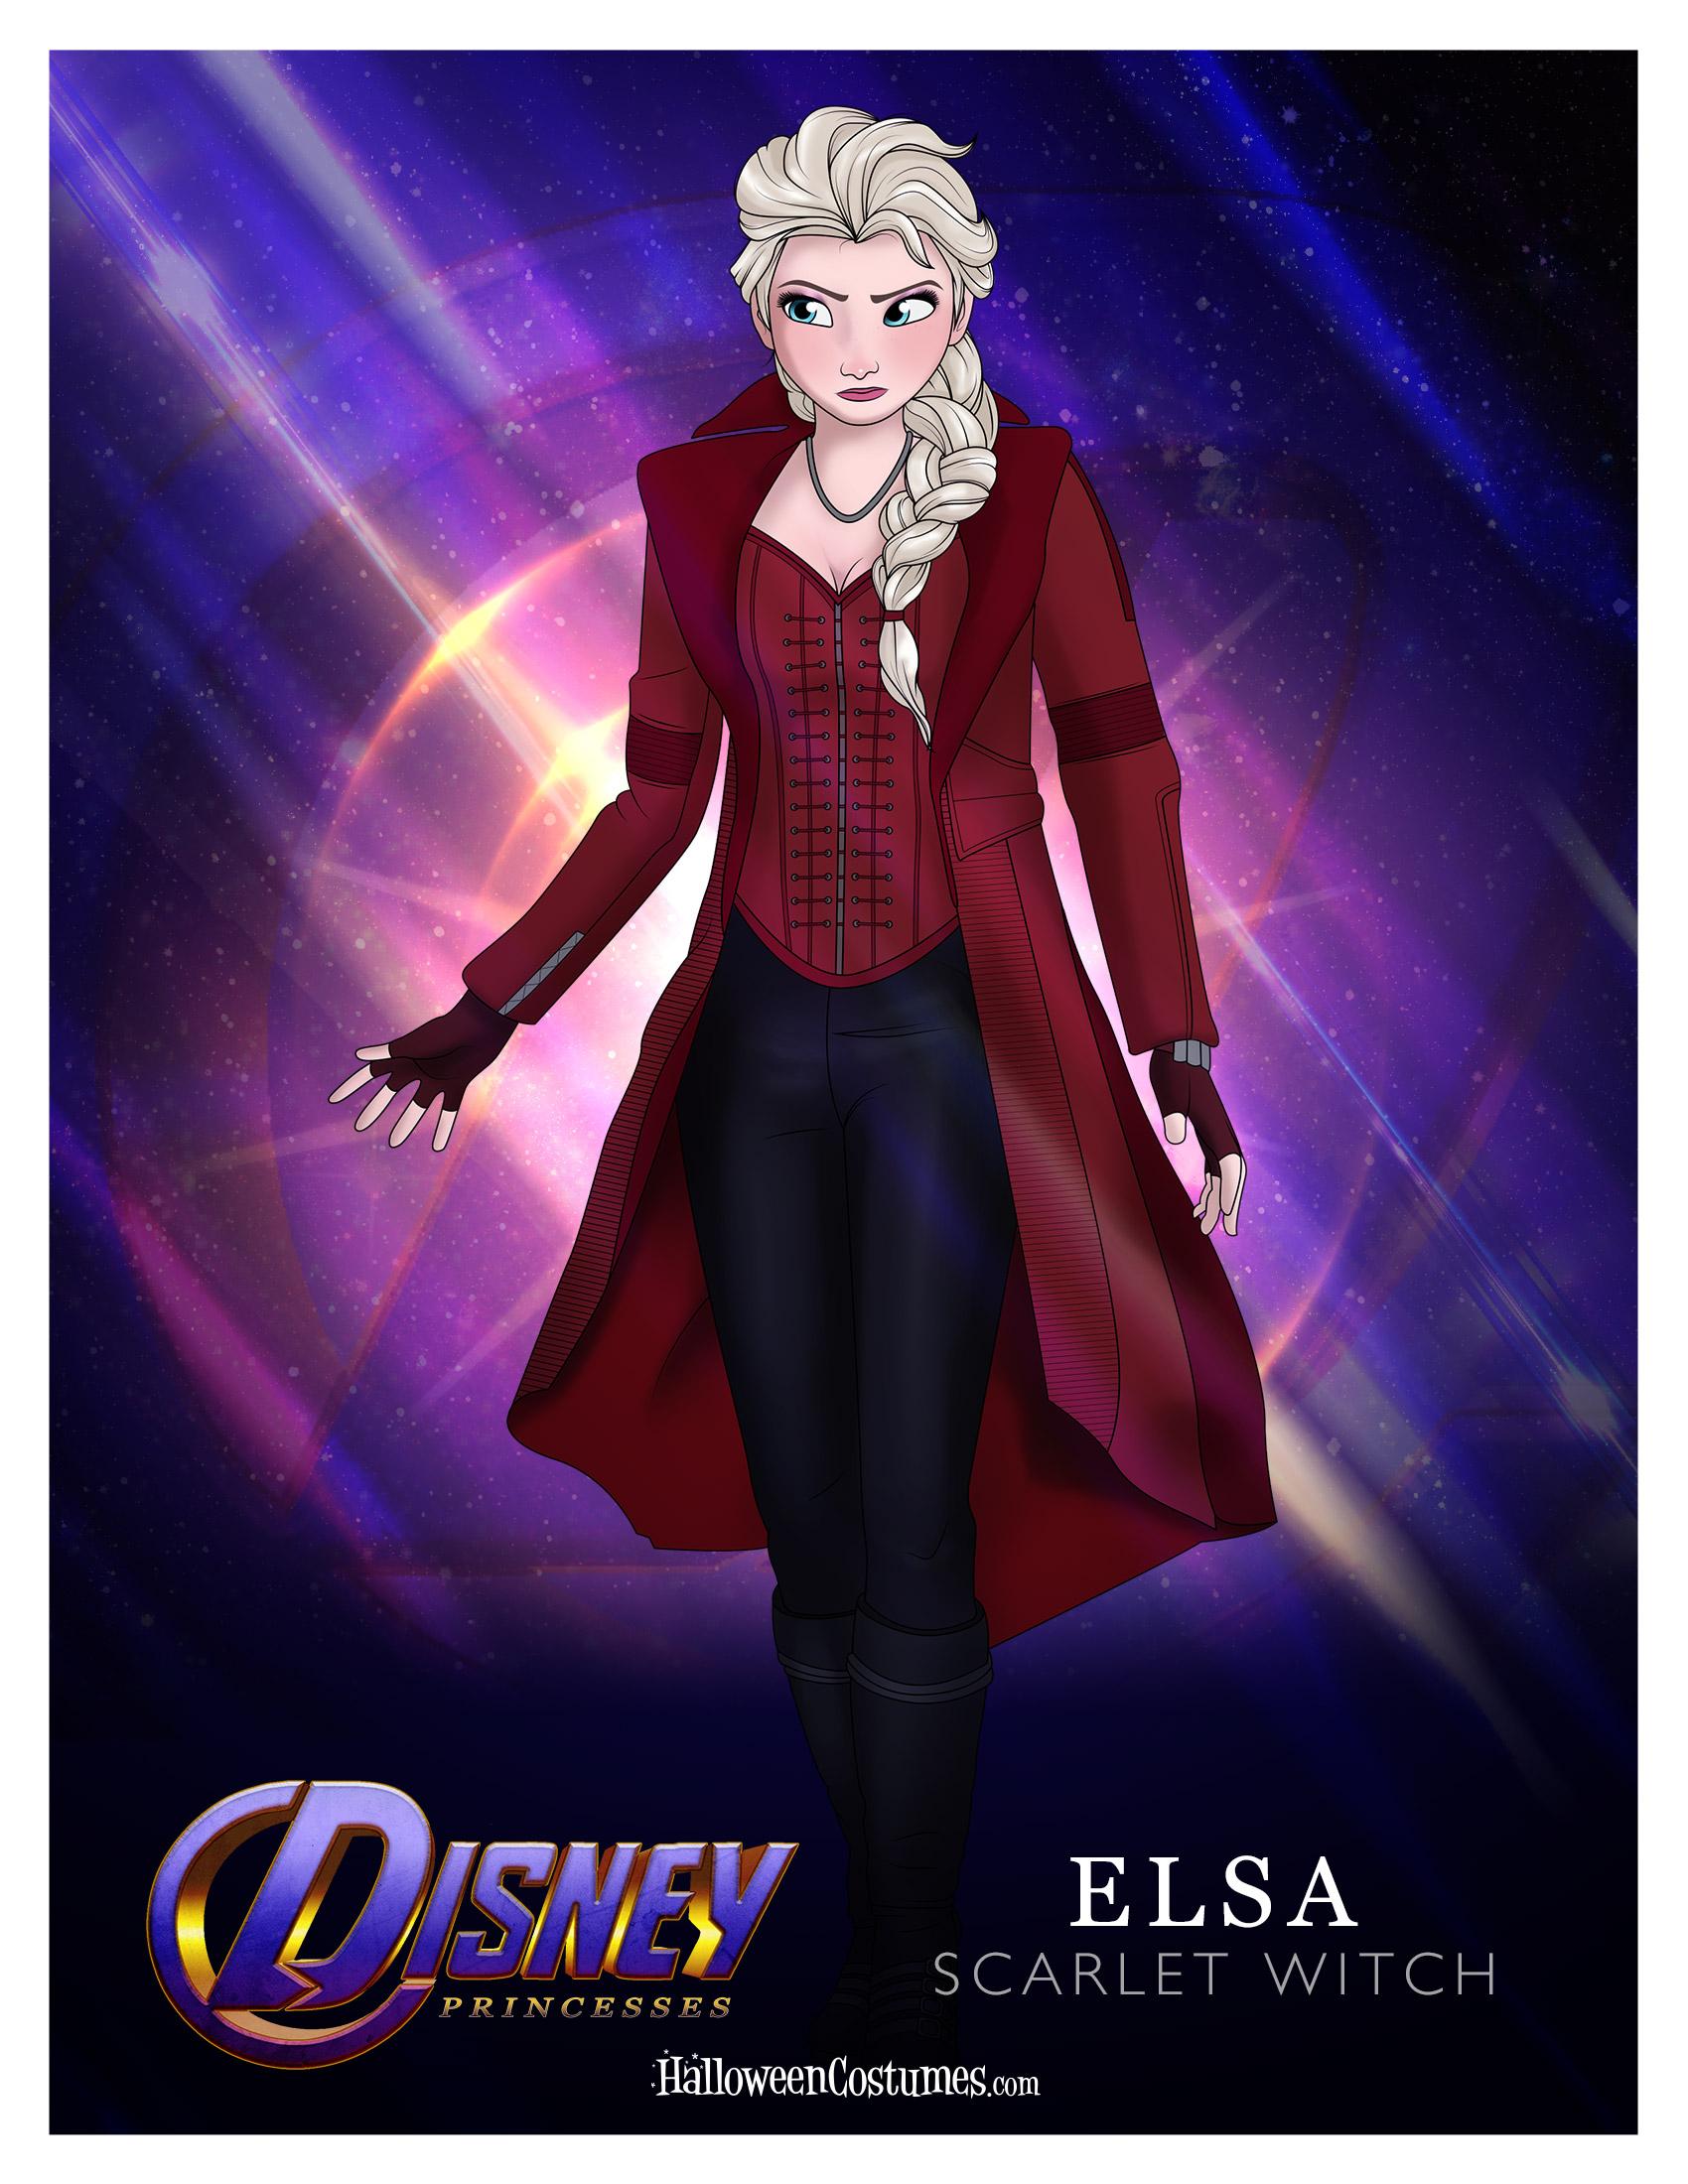 Princess Elsa as Scarlet Witch